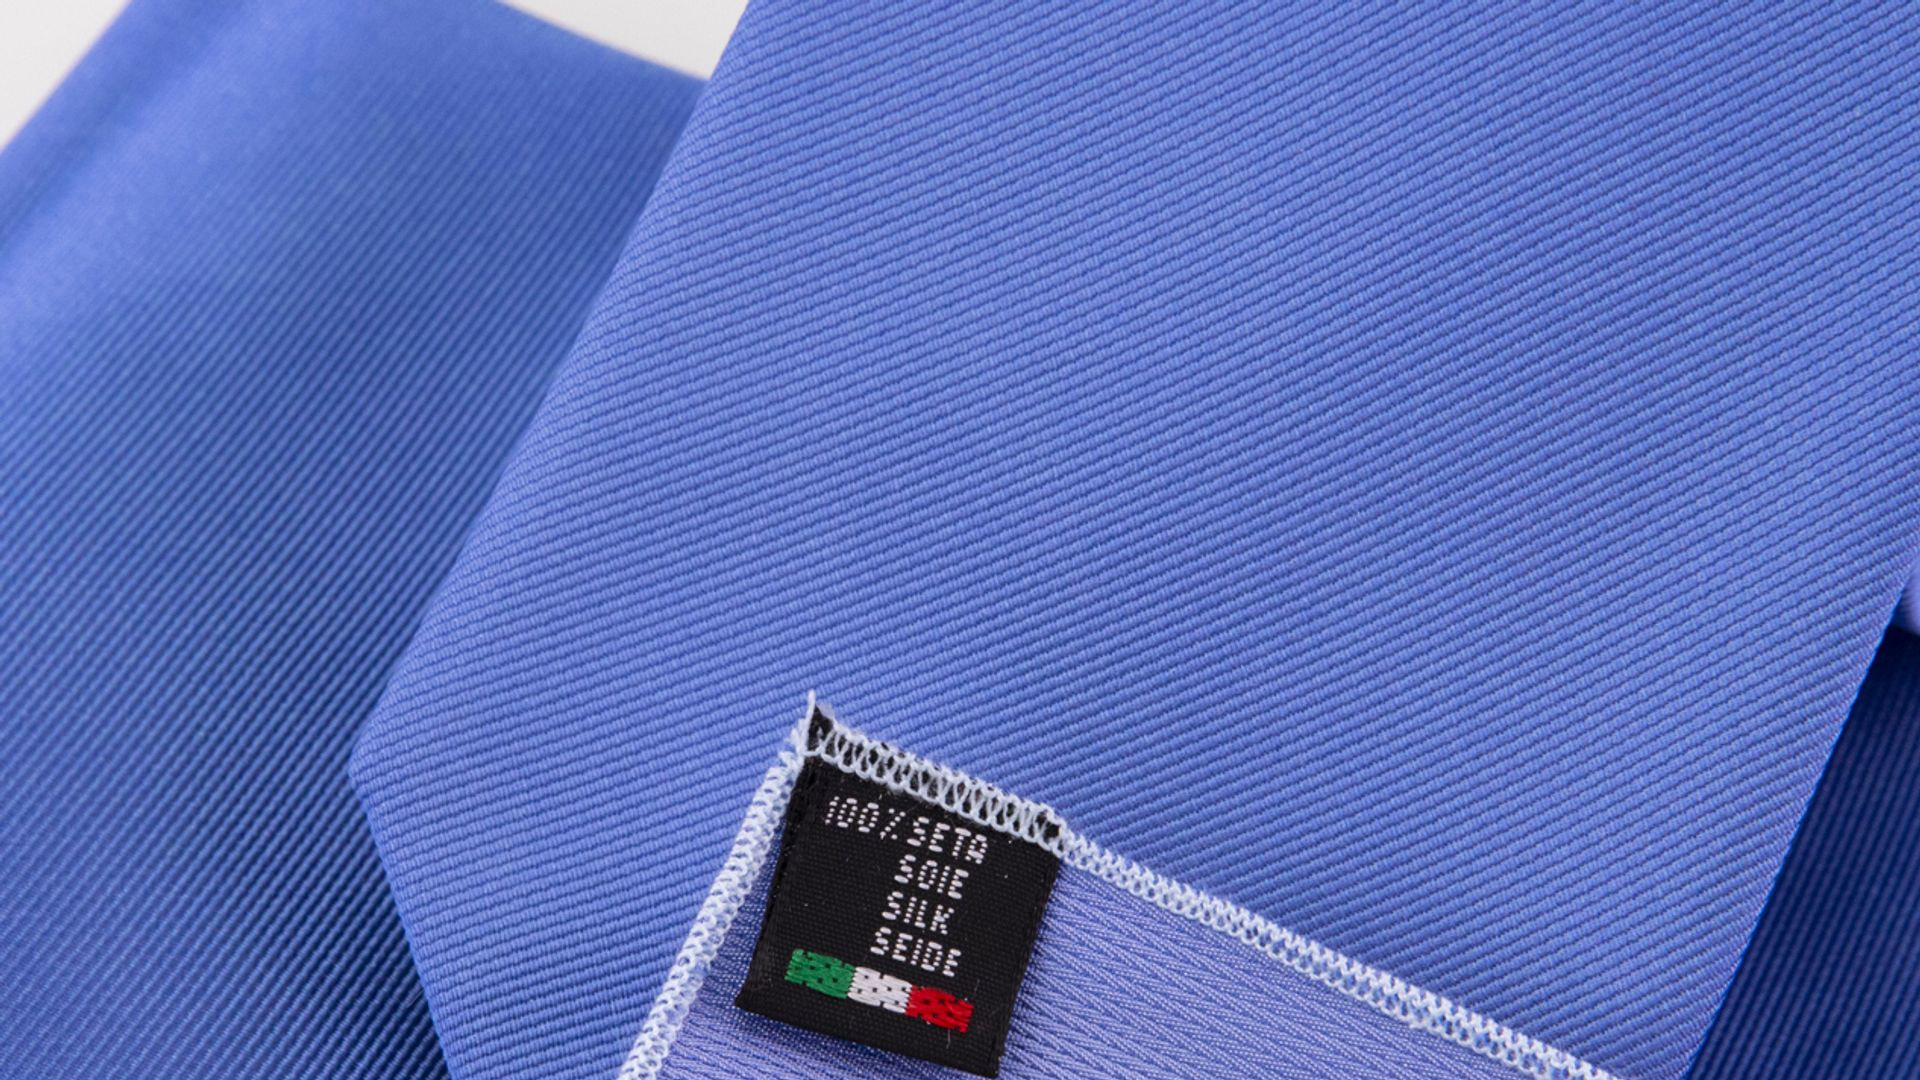 Cravatte in pura seta fatte a mano